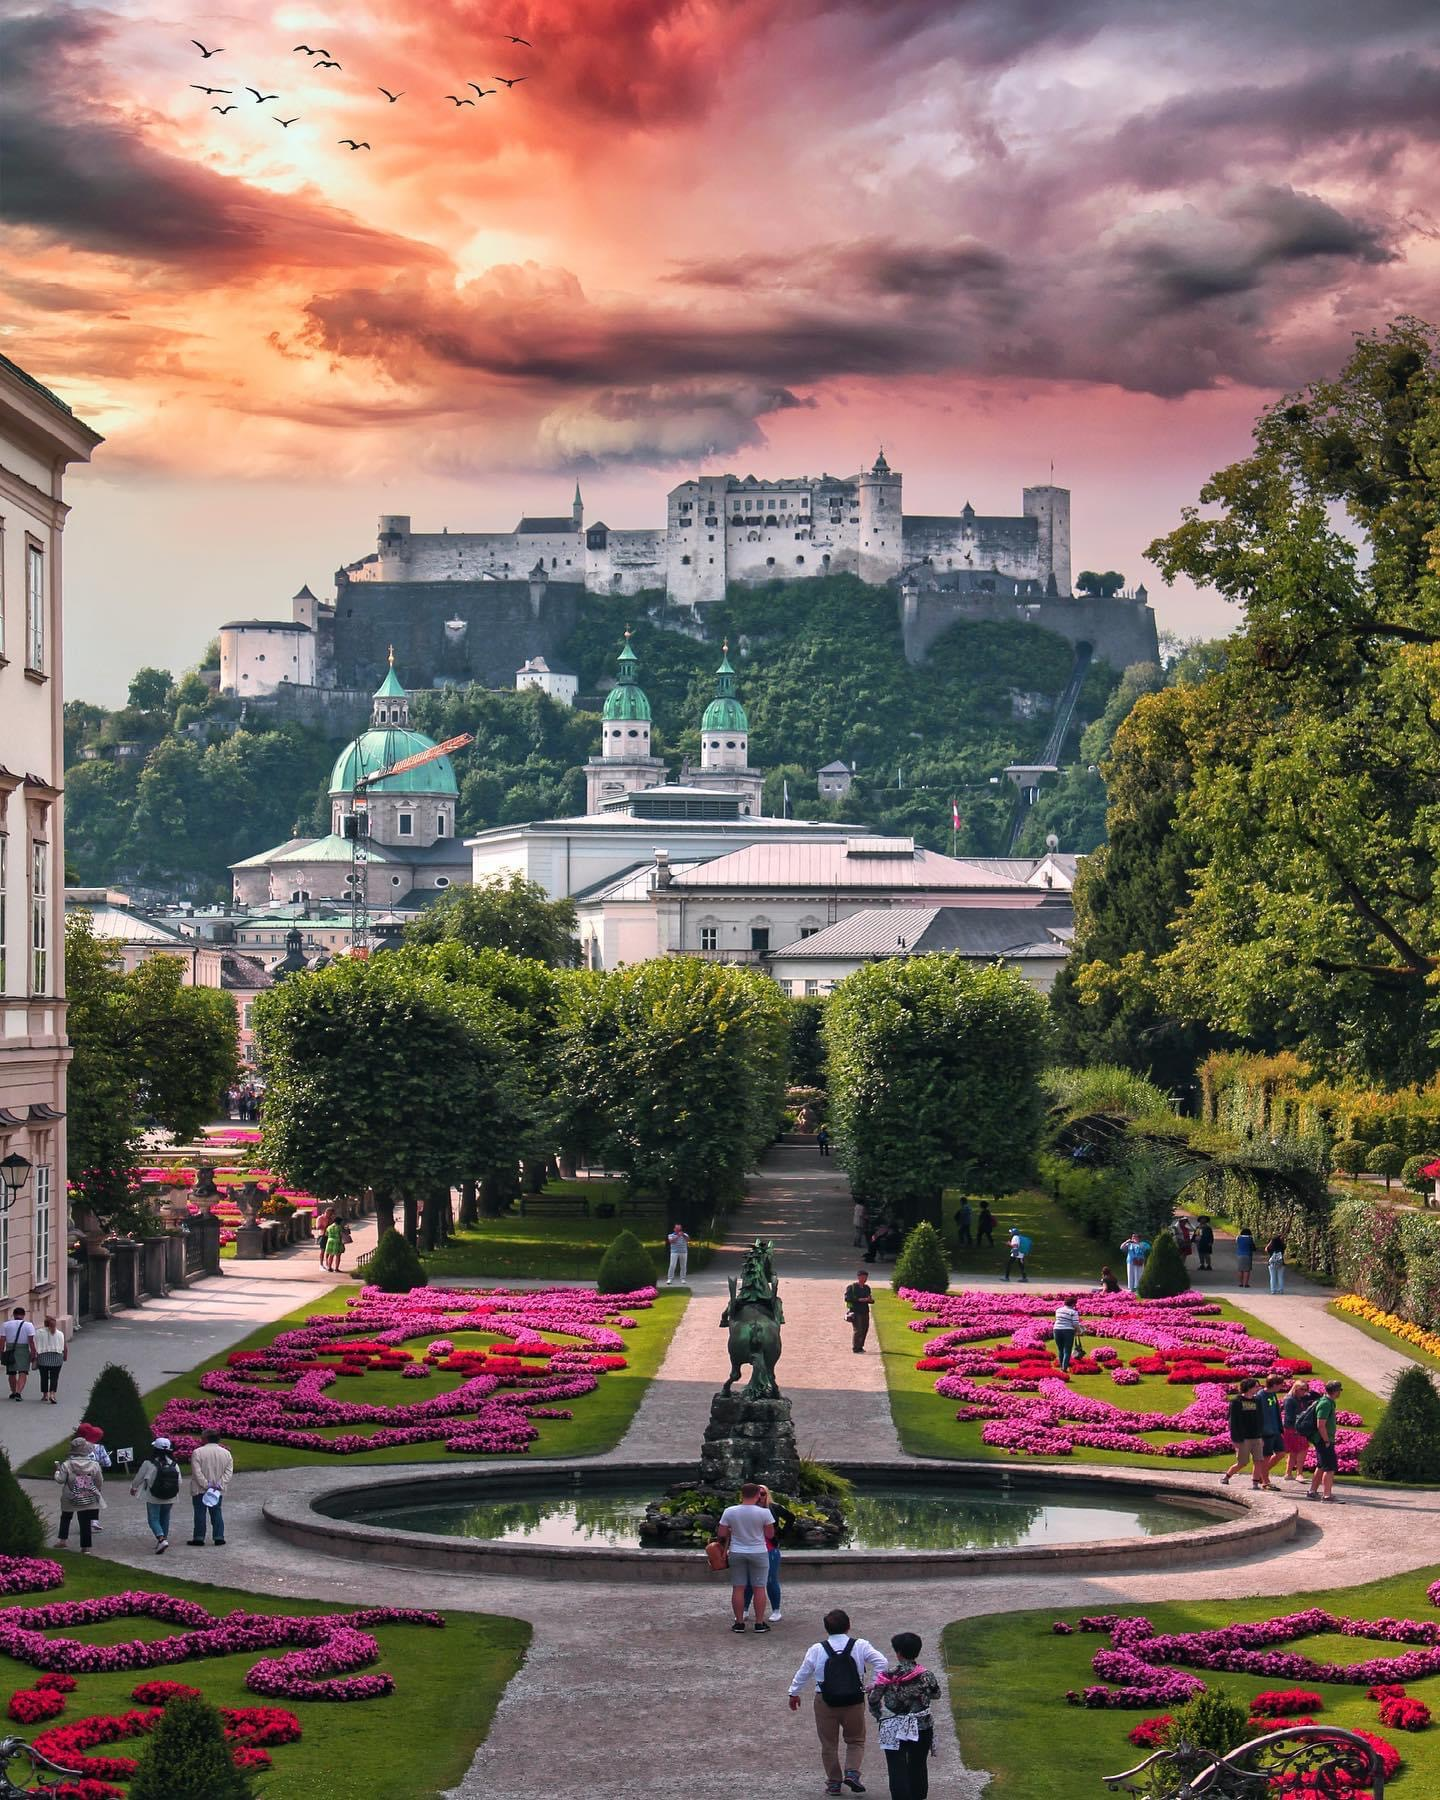 Зальцбург, Австрия. Фото Флориан Ольбрехтс